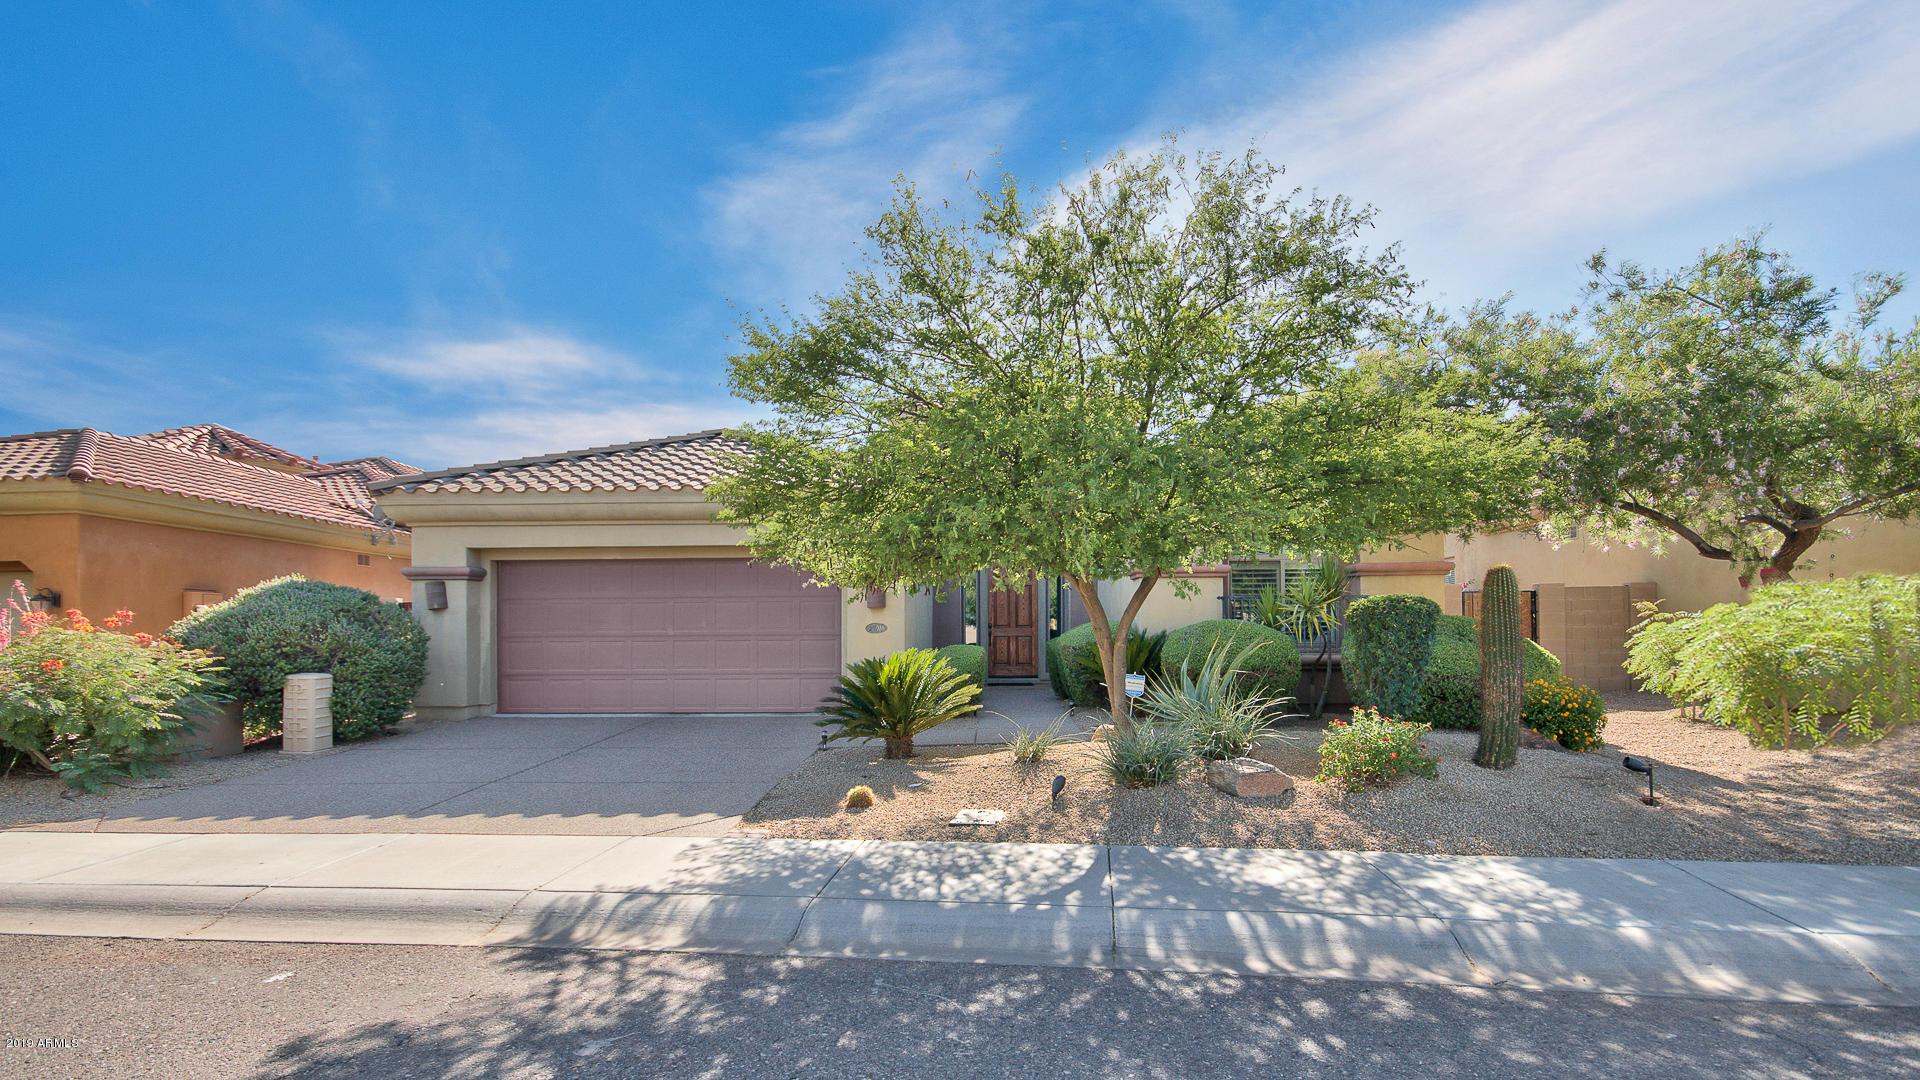 Photo of 22016 N 36TH Street, Phoenix, AZ 85050